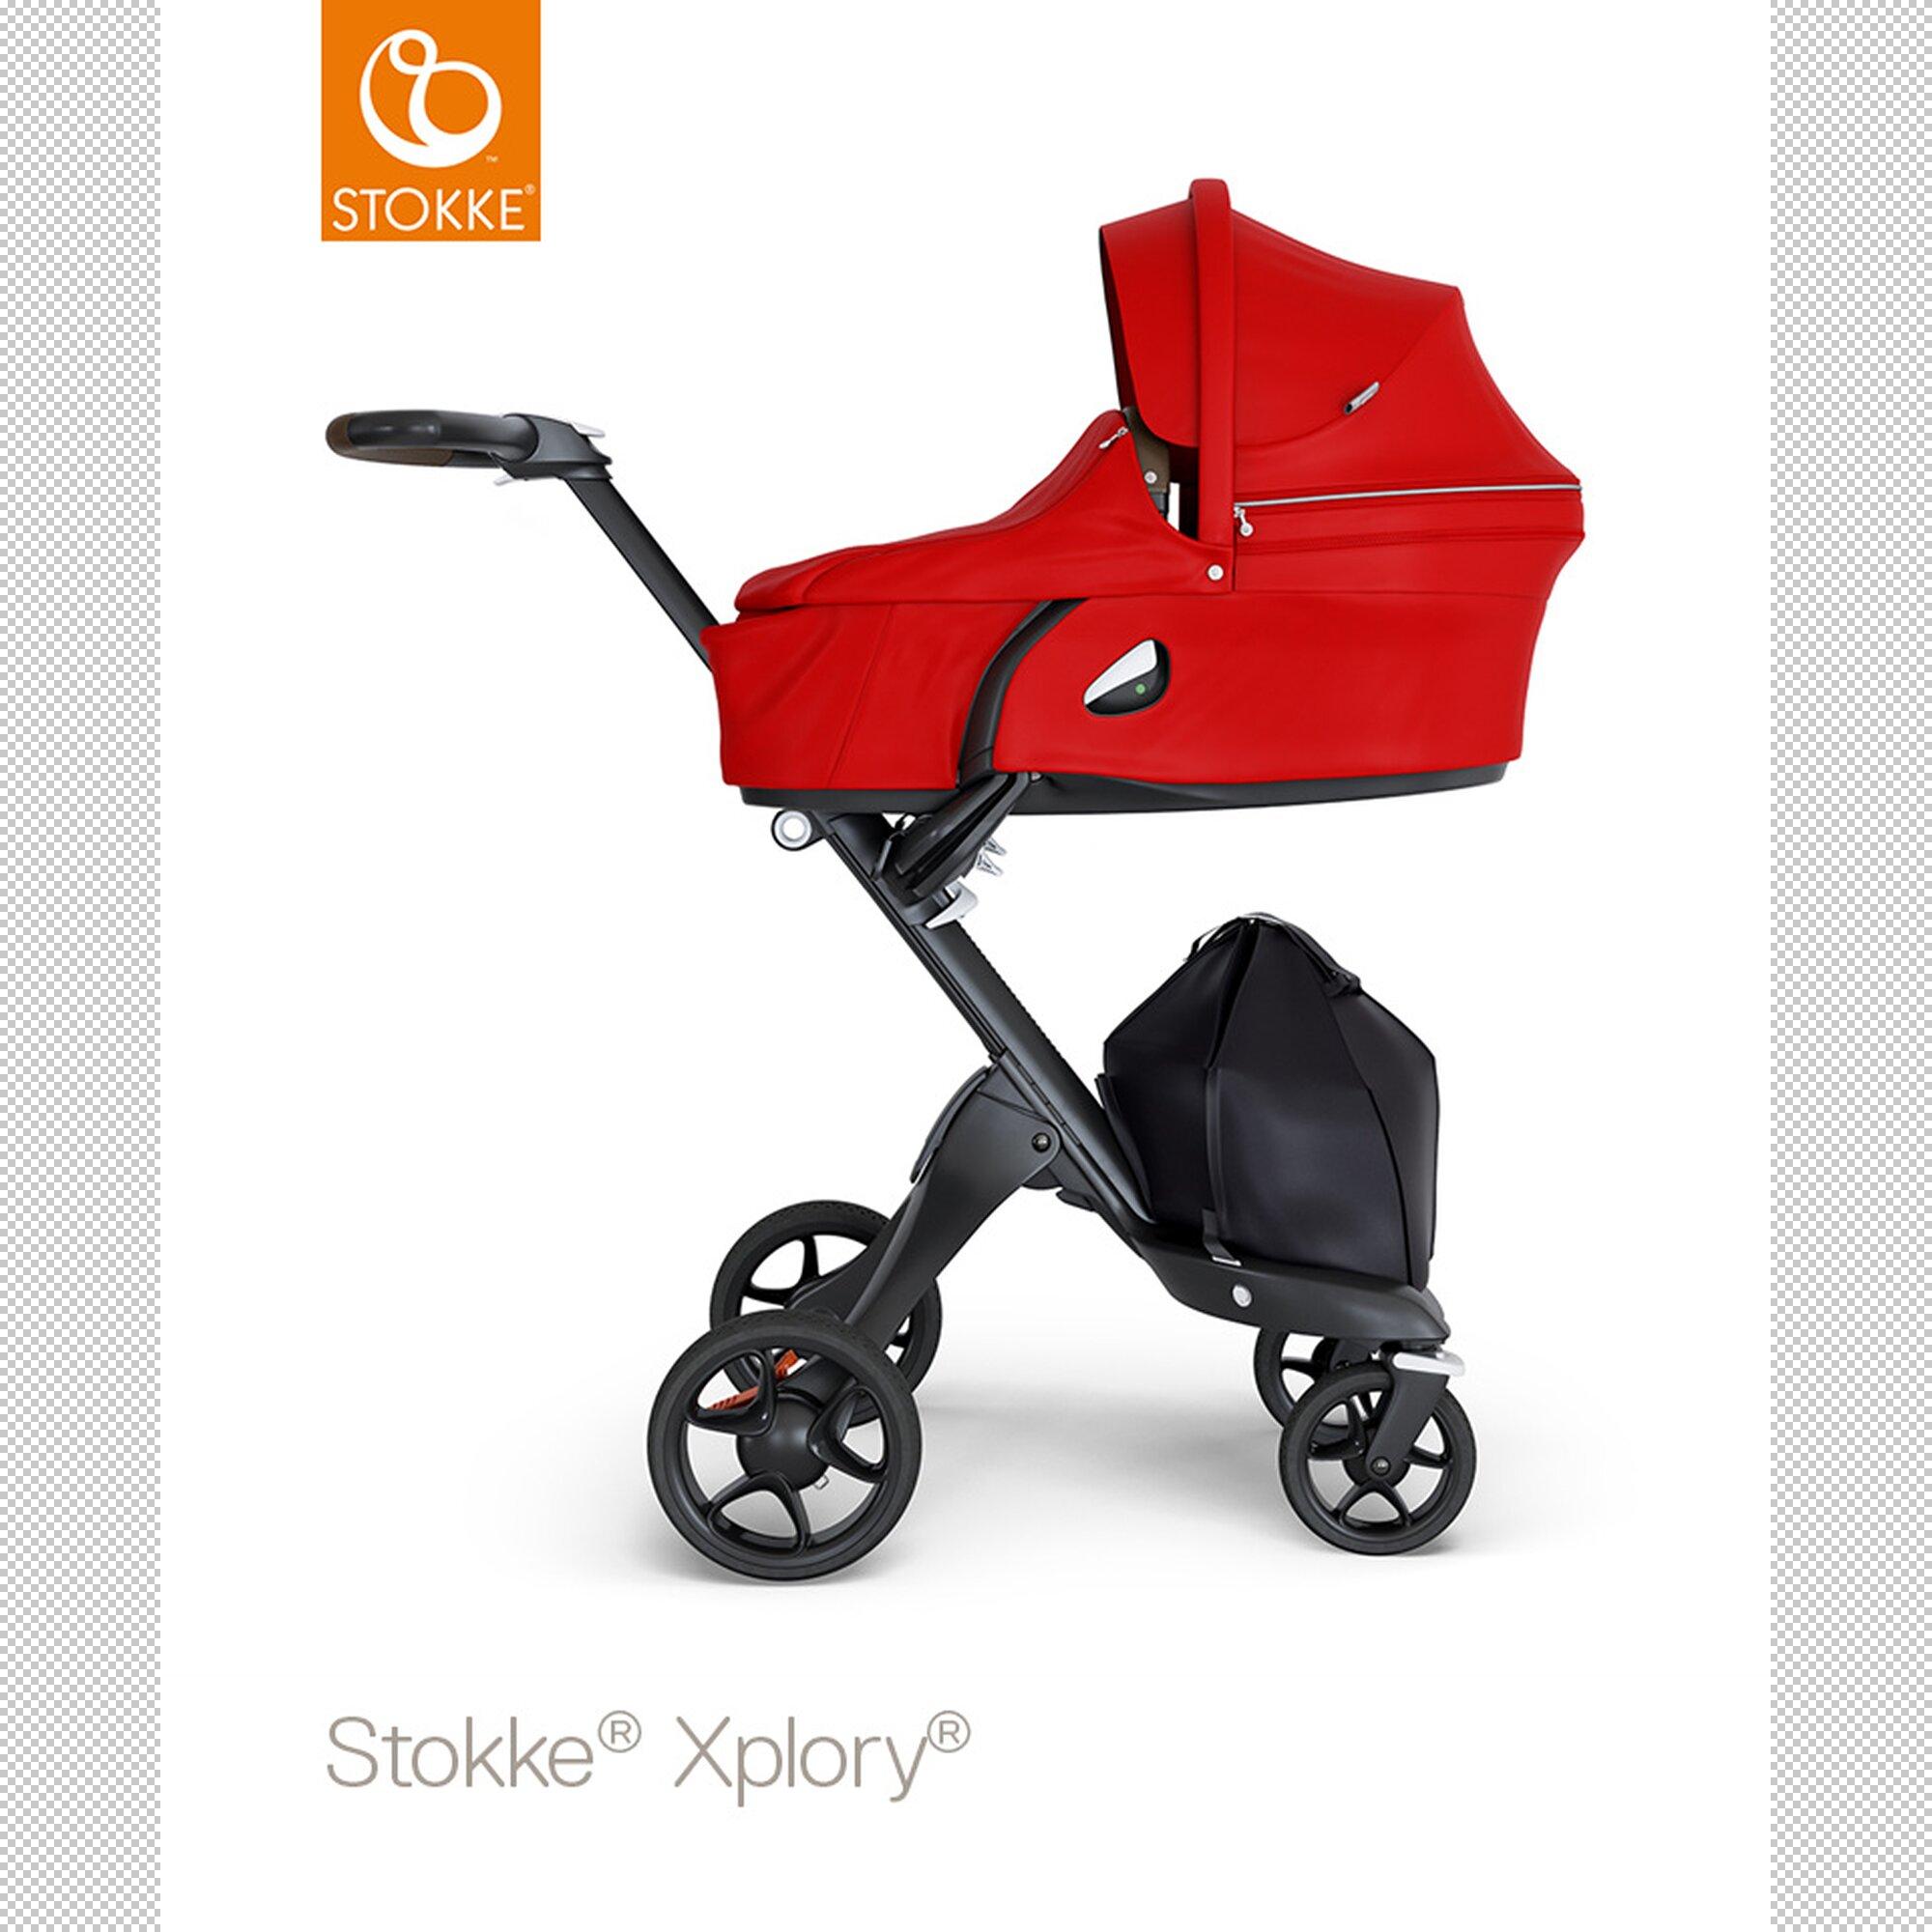 stokke-tragewanne-xplory-v6-rot